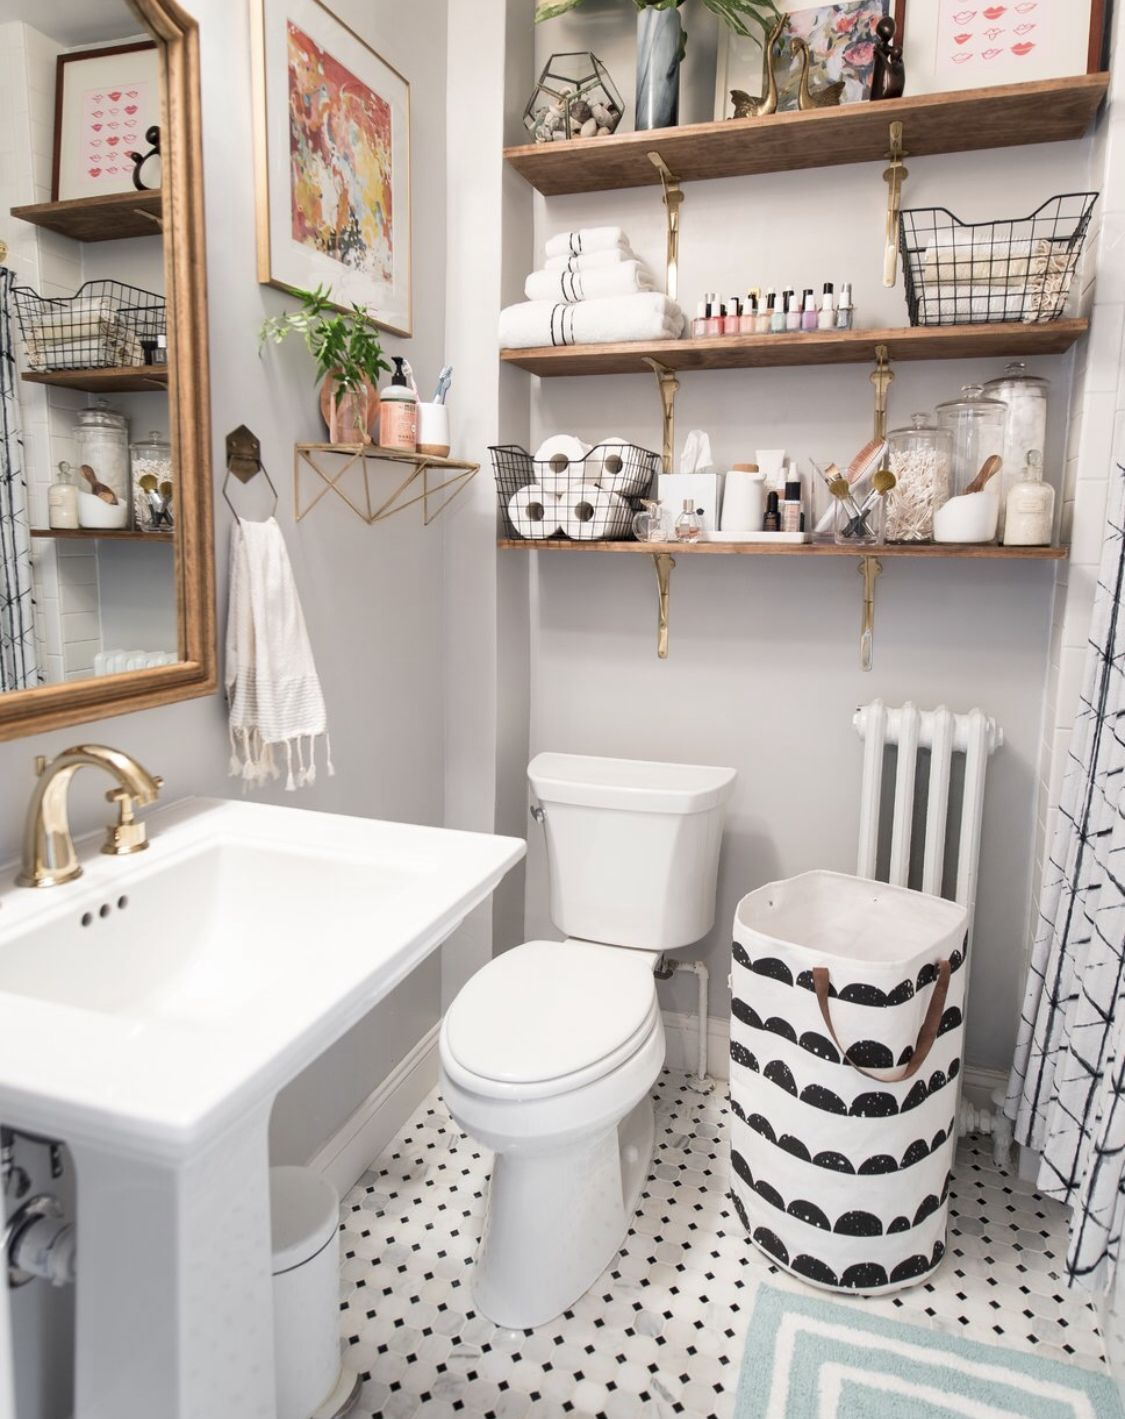 Home Decor 20 Cute Bathroom Countertop Ideas You Can Copy Now Small Bathroom Furniture Classic Small Bathrooms Small Bathroom Decor